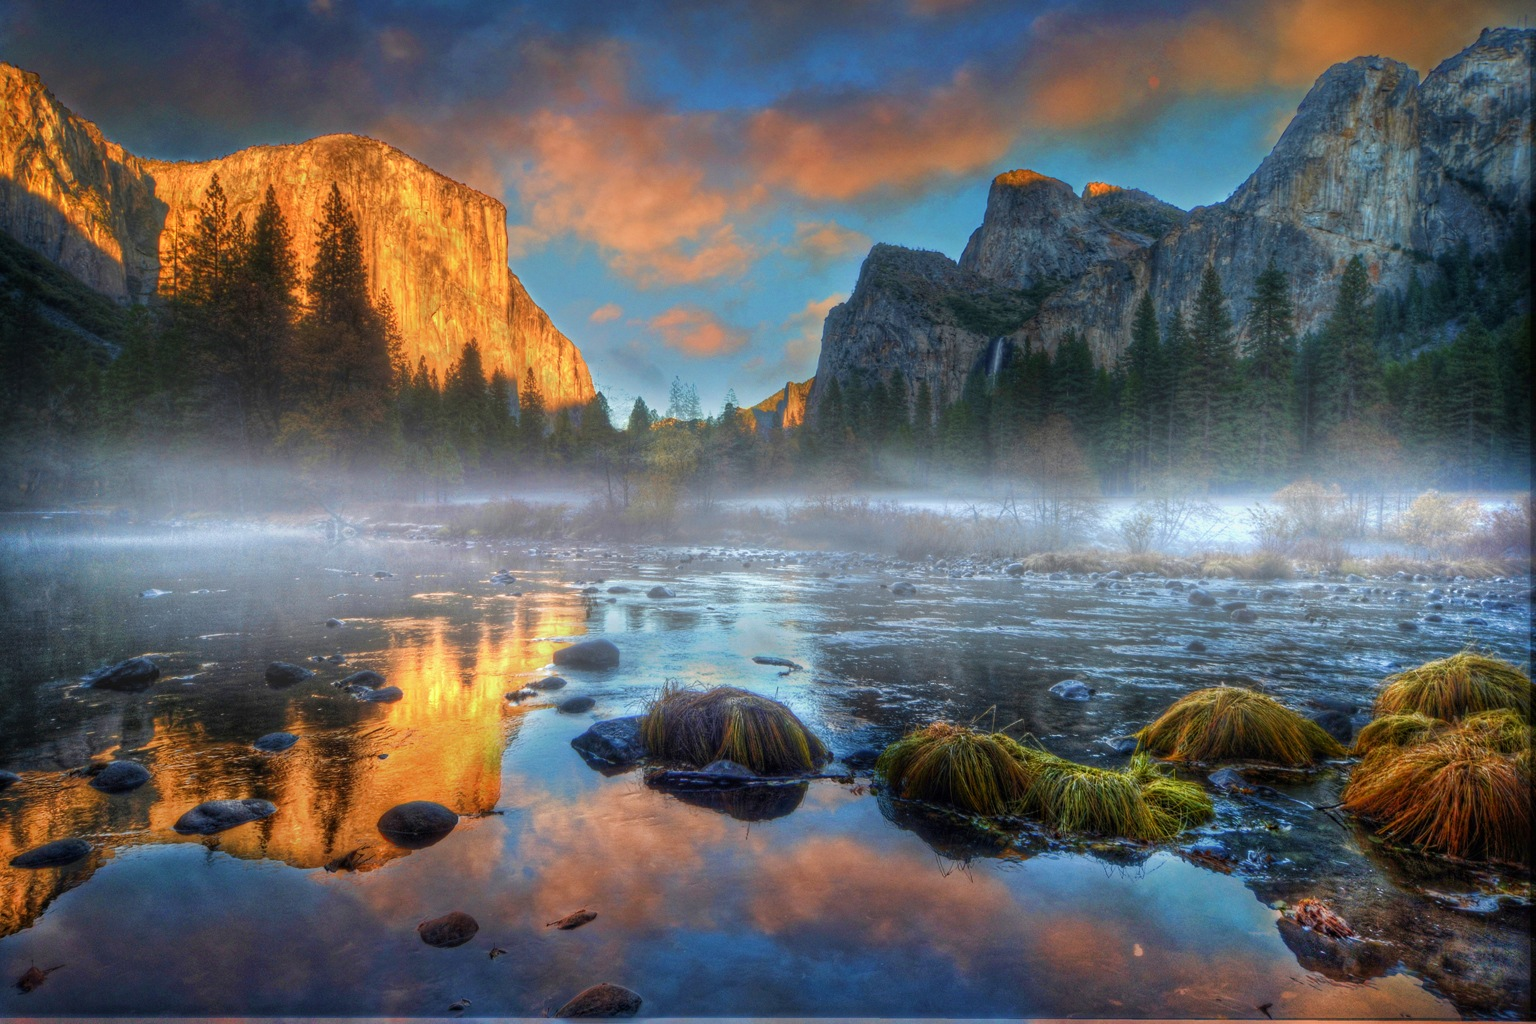 Yosemite by Mark Teufel